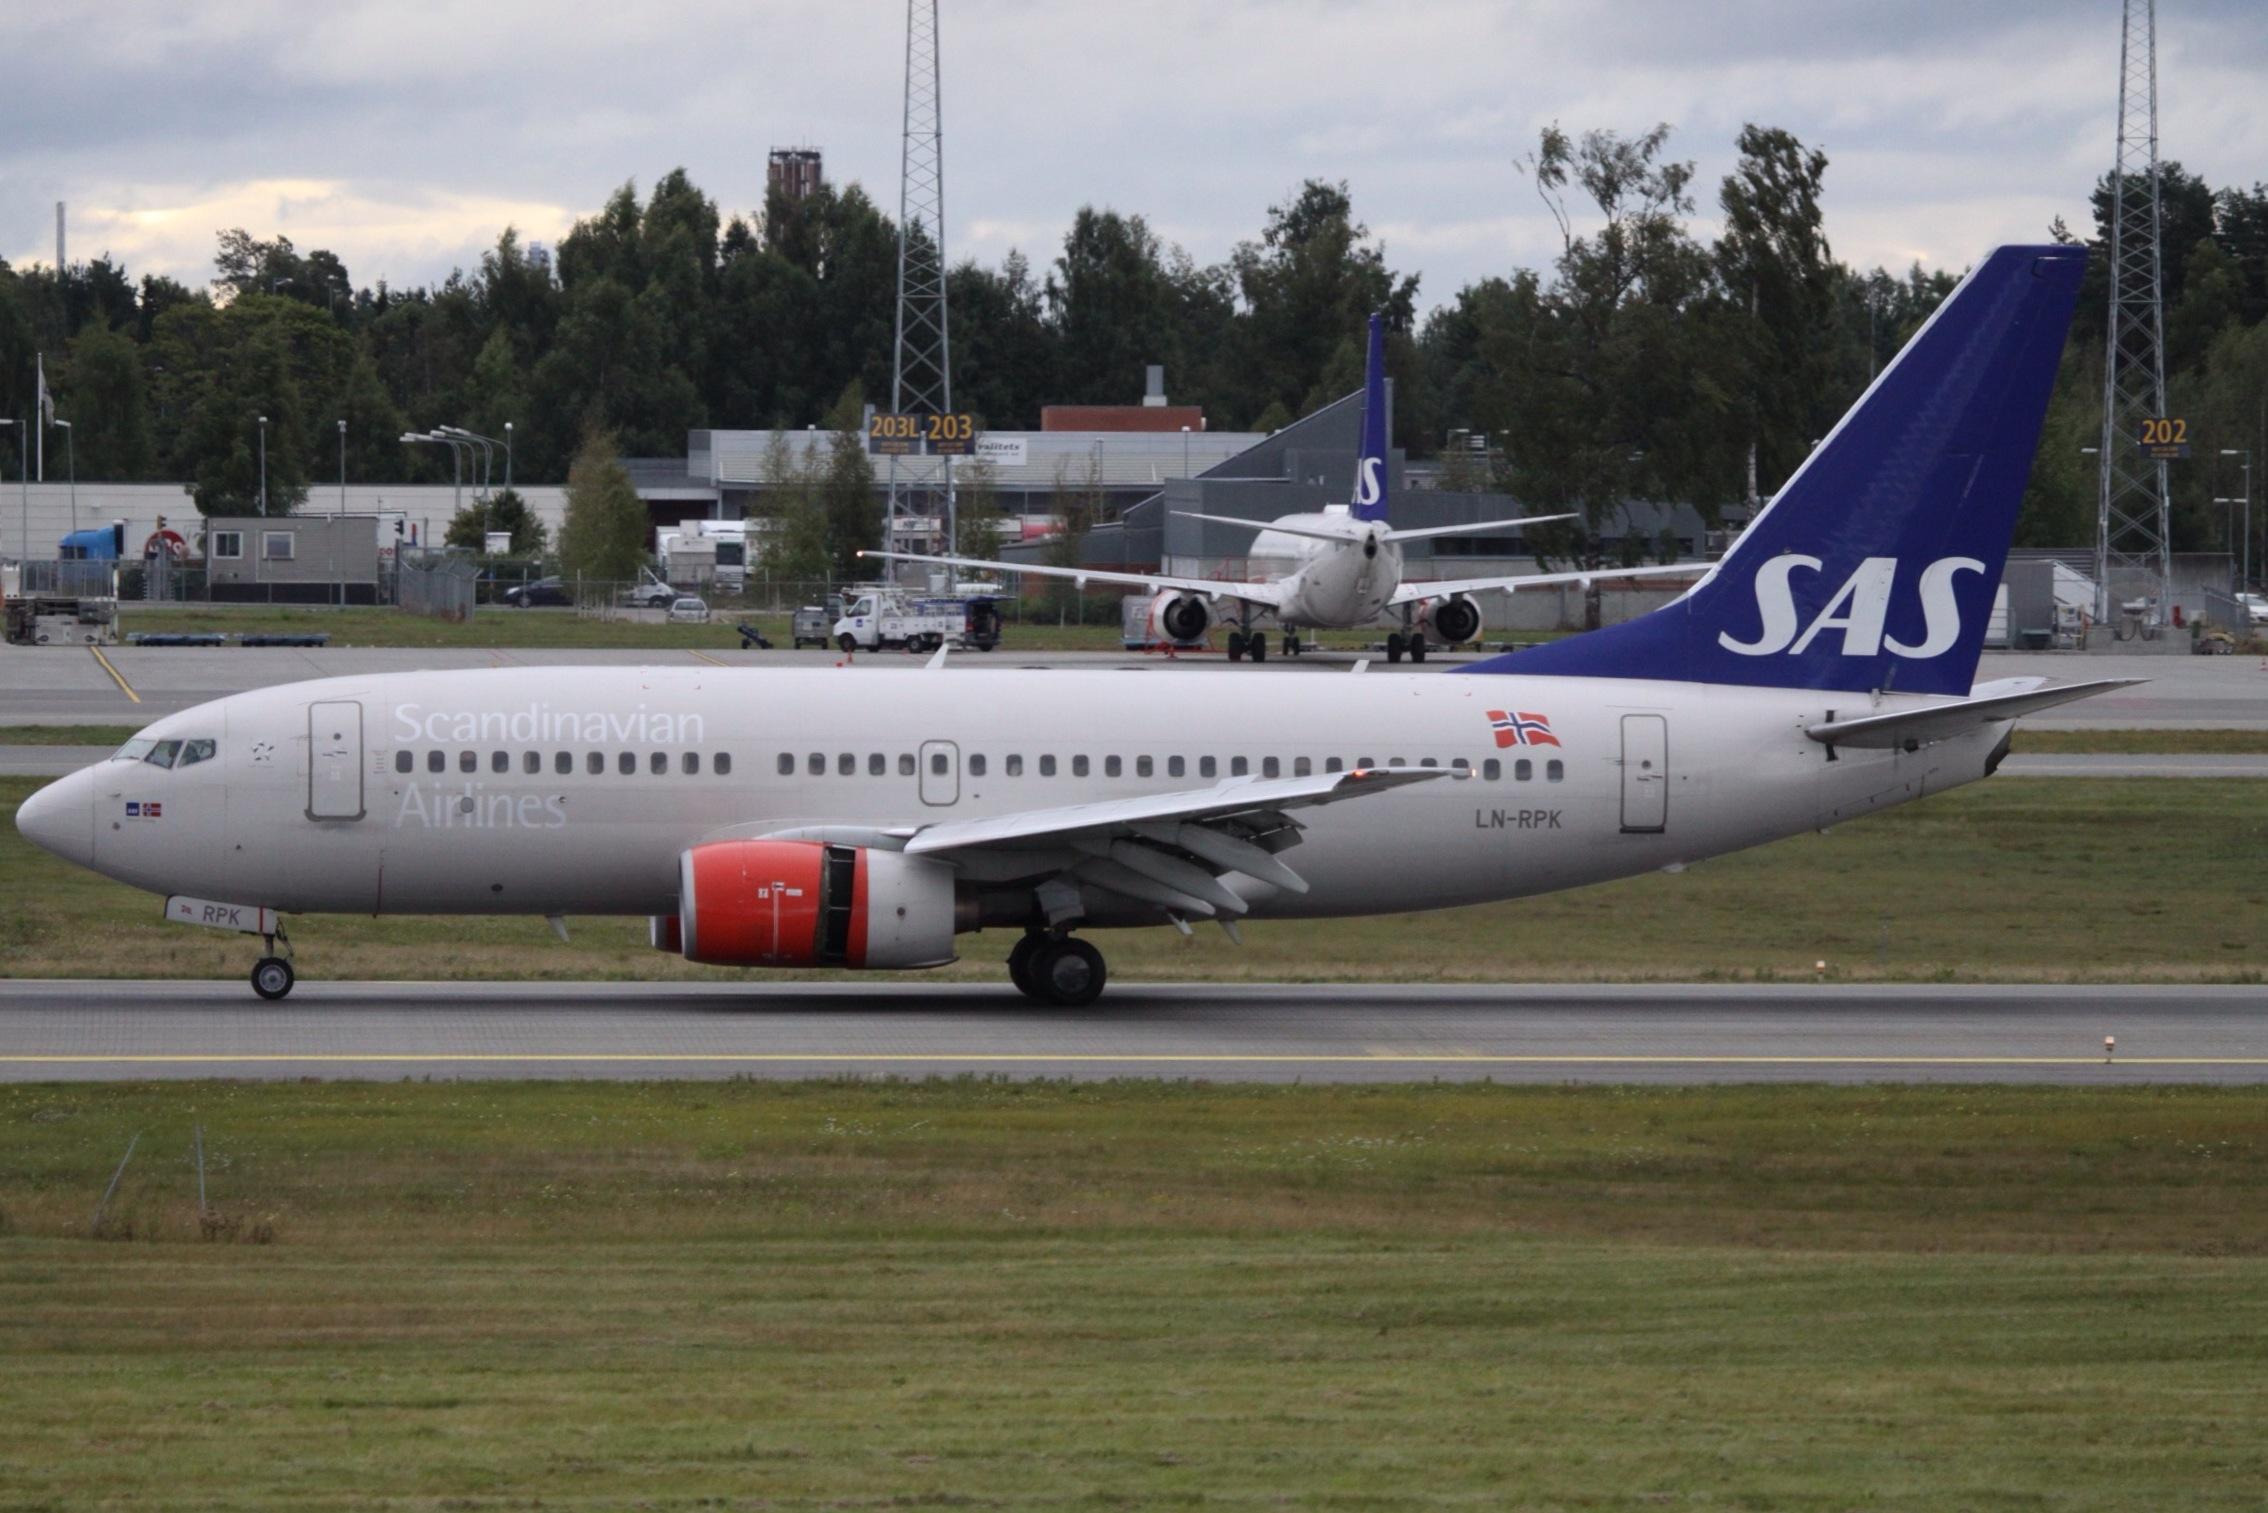 En Boeing 737-700 med registreringen LN-RPK fra SAS. Foto: Aeroprints.com, CC 3.0